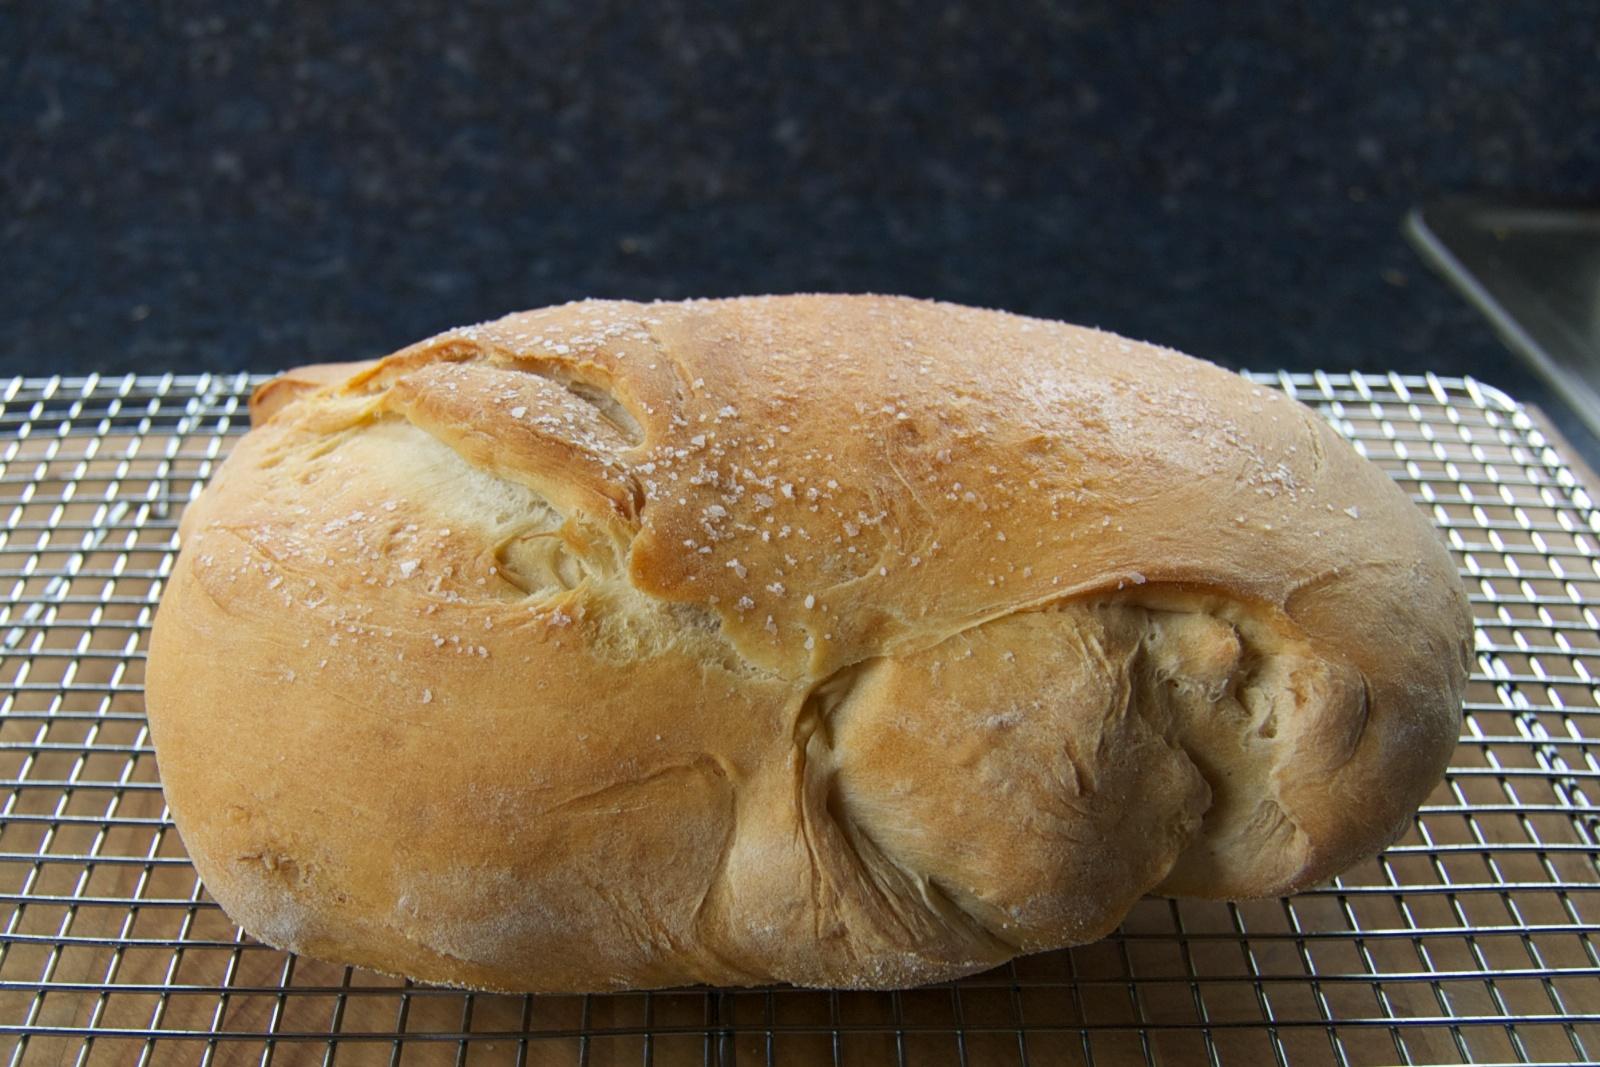 http://blog.rickk.com/food/2012/06/26/ate.2012.06.26.c3.jpg